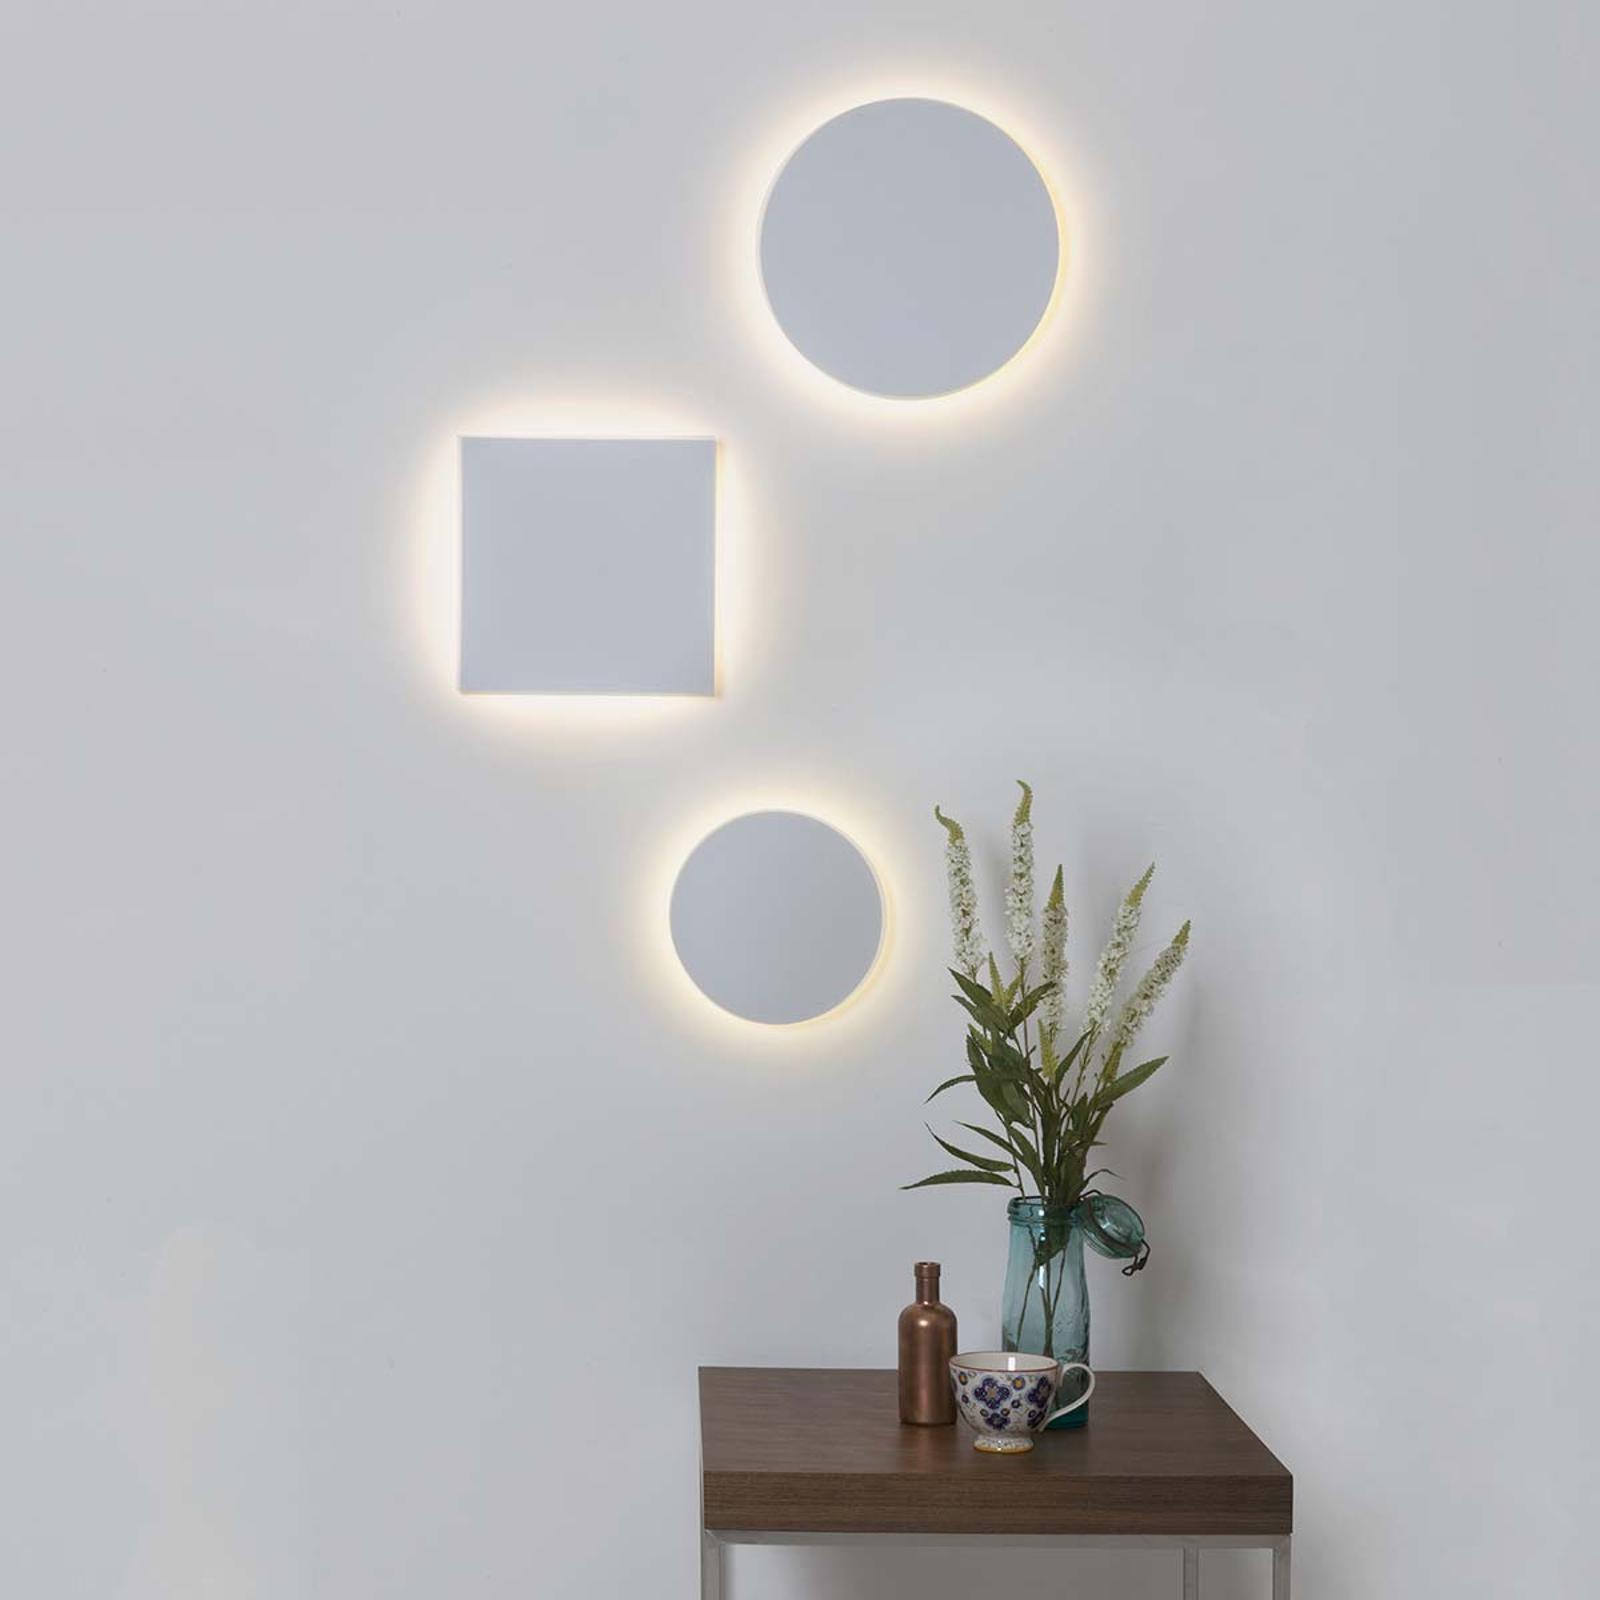 Eclipse Round: lámpara de pared LED de gran efecto